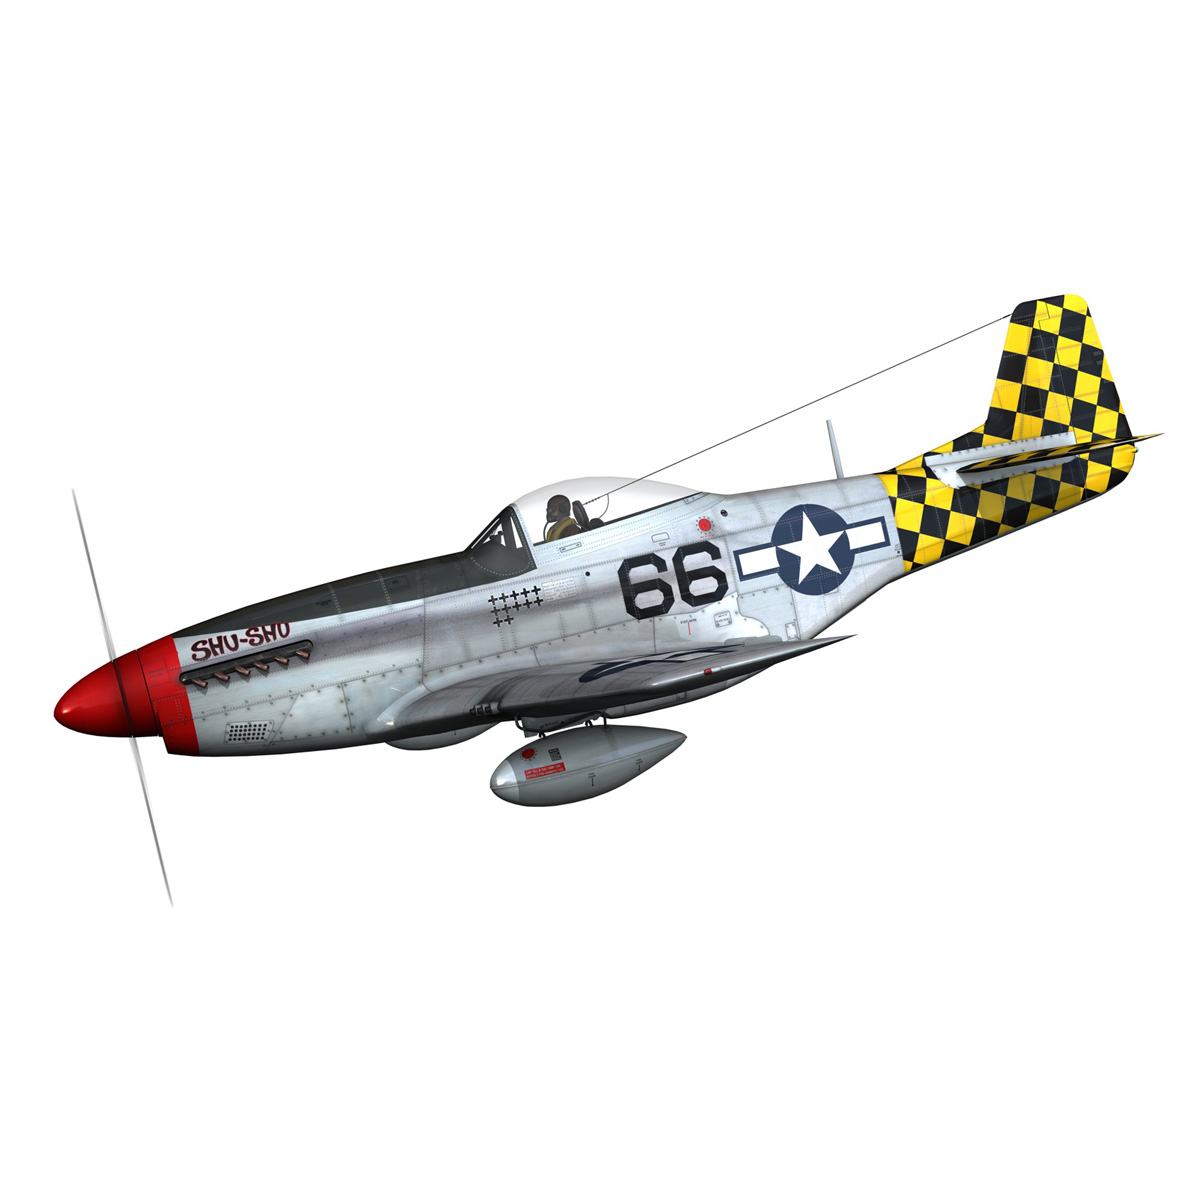 north american p-51d mustang – shu shu 3d model fbx lwo lw lws obj c4d 266238